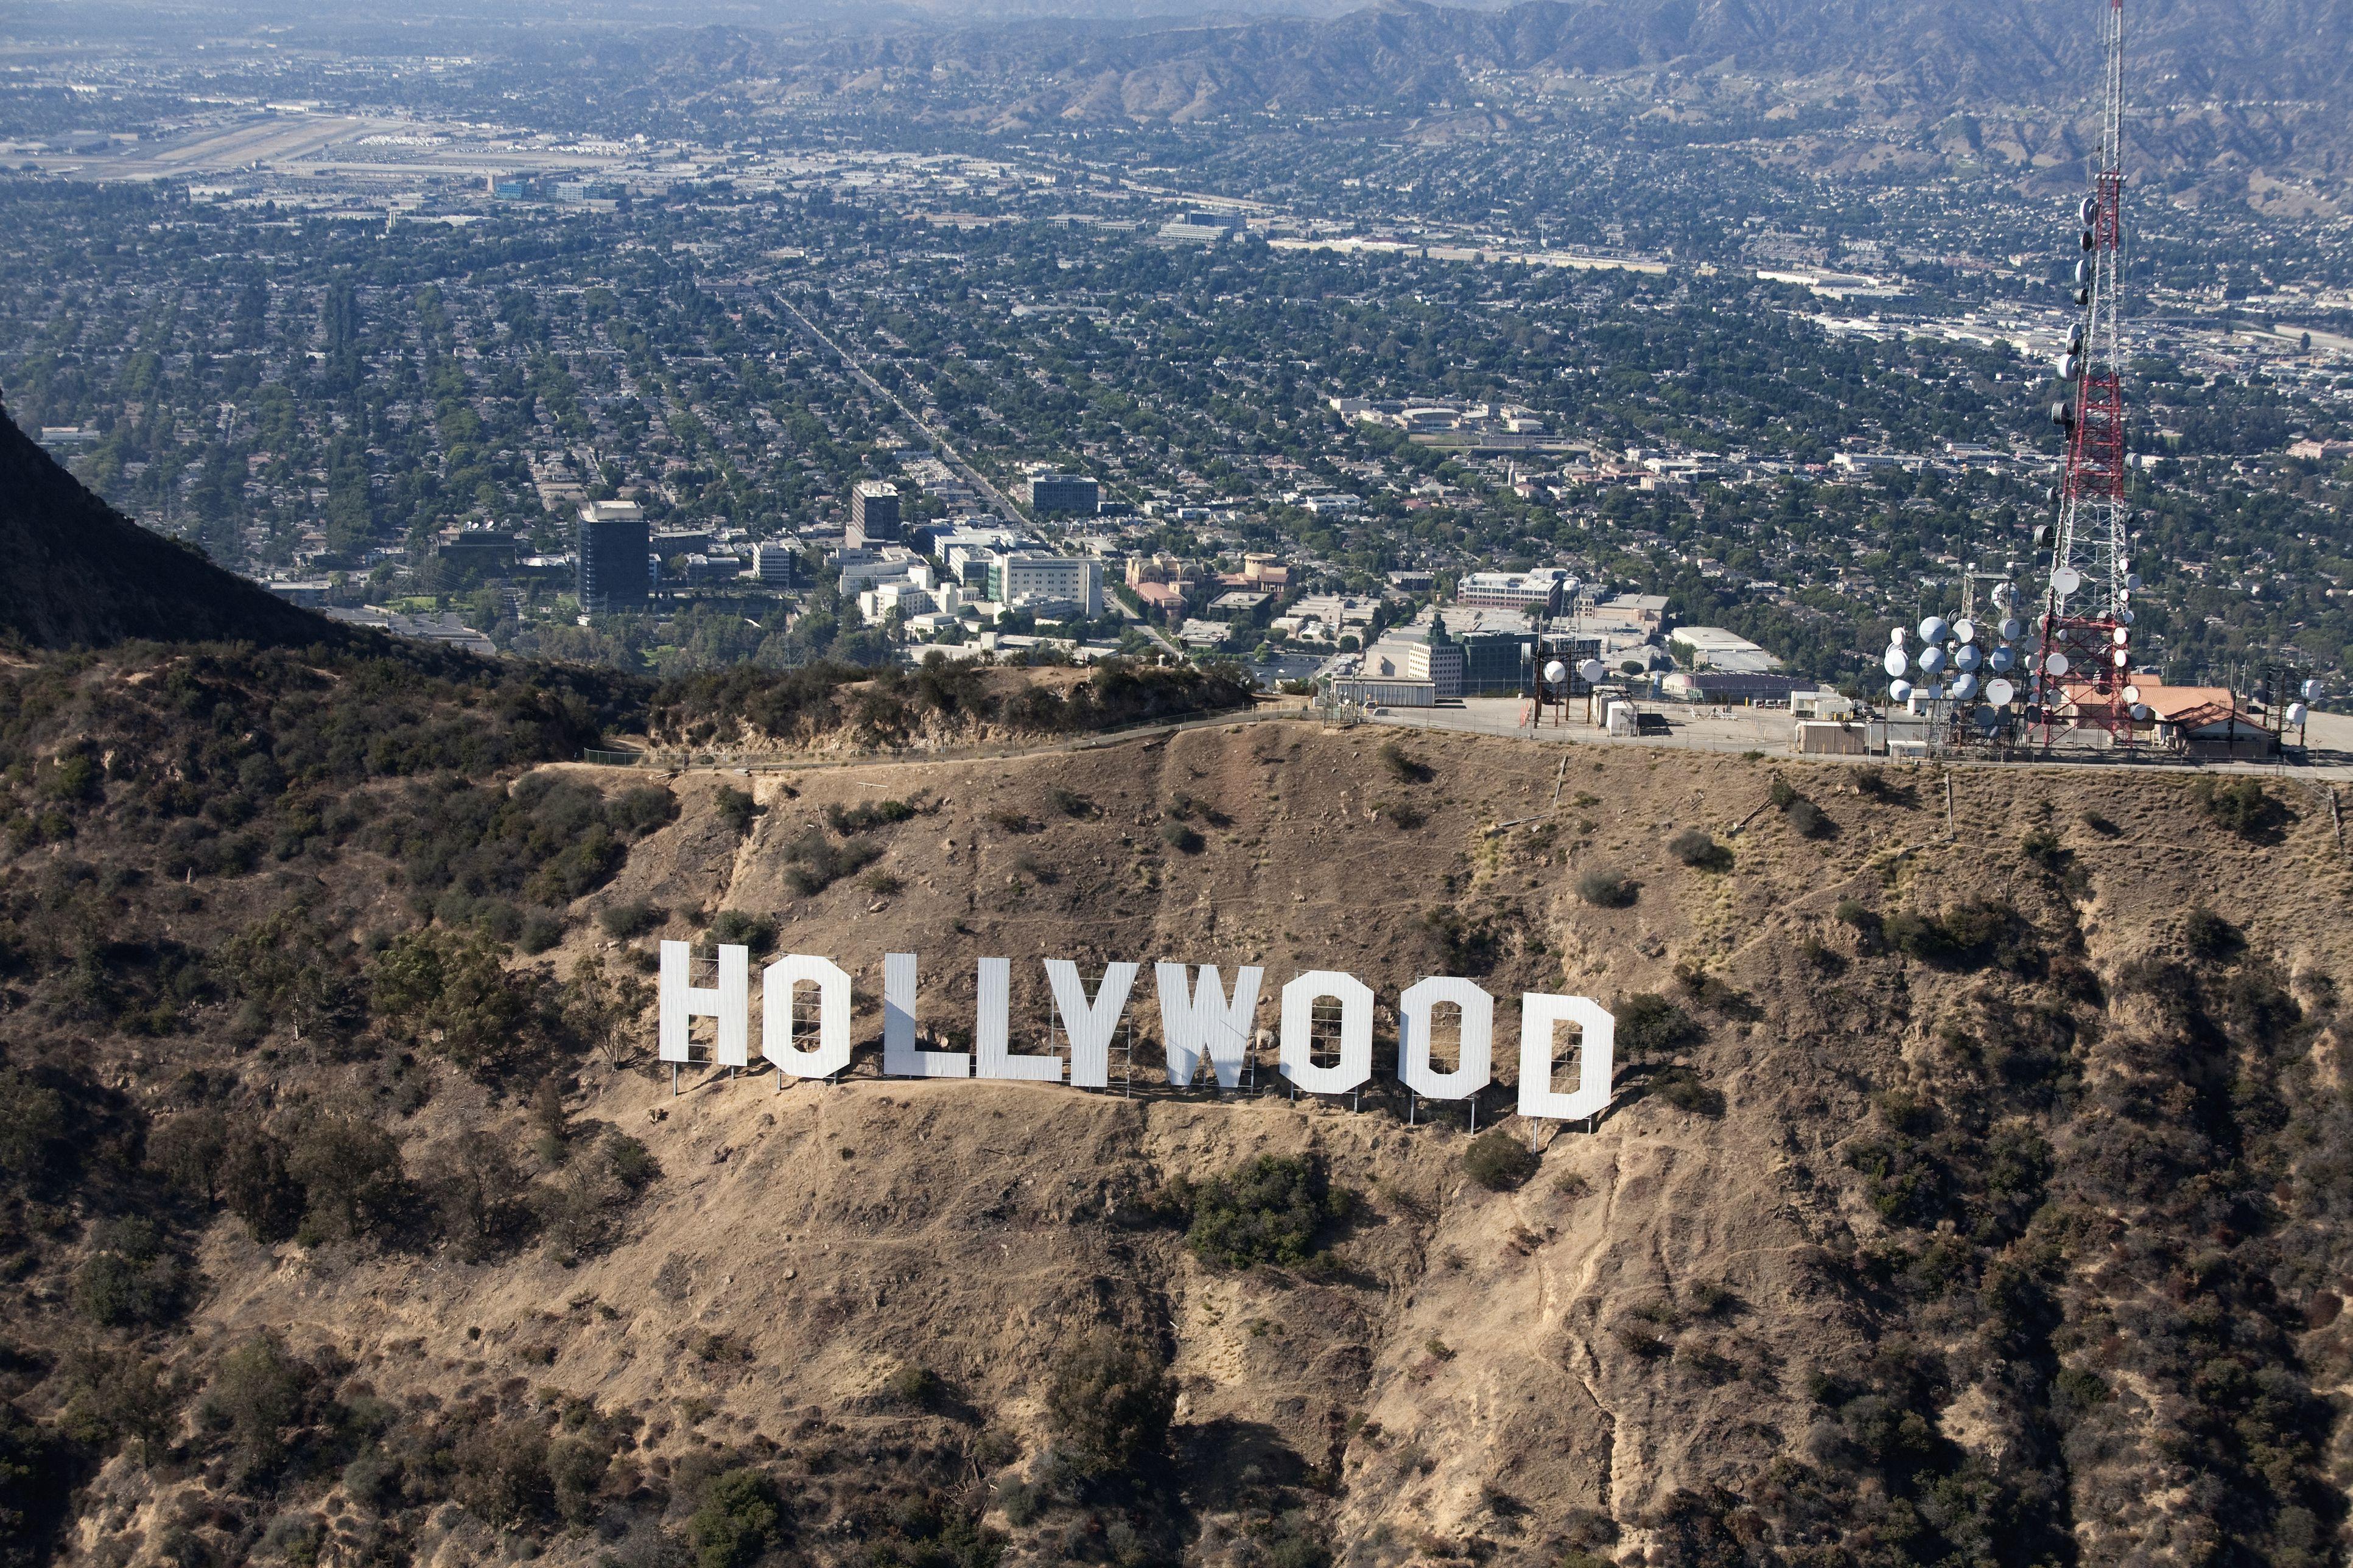 Hollywood free bdsm photo 45